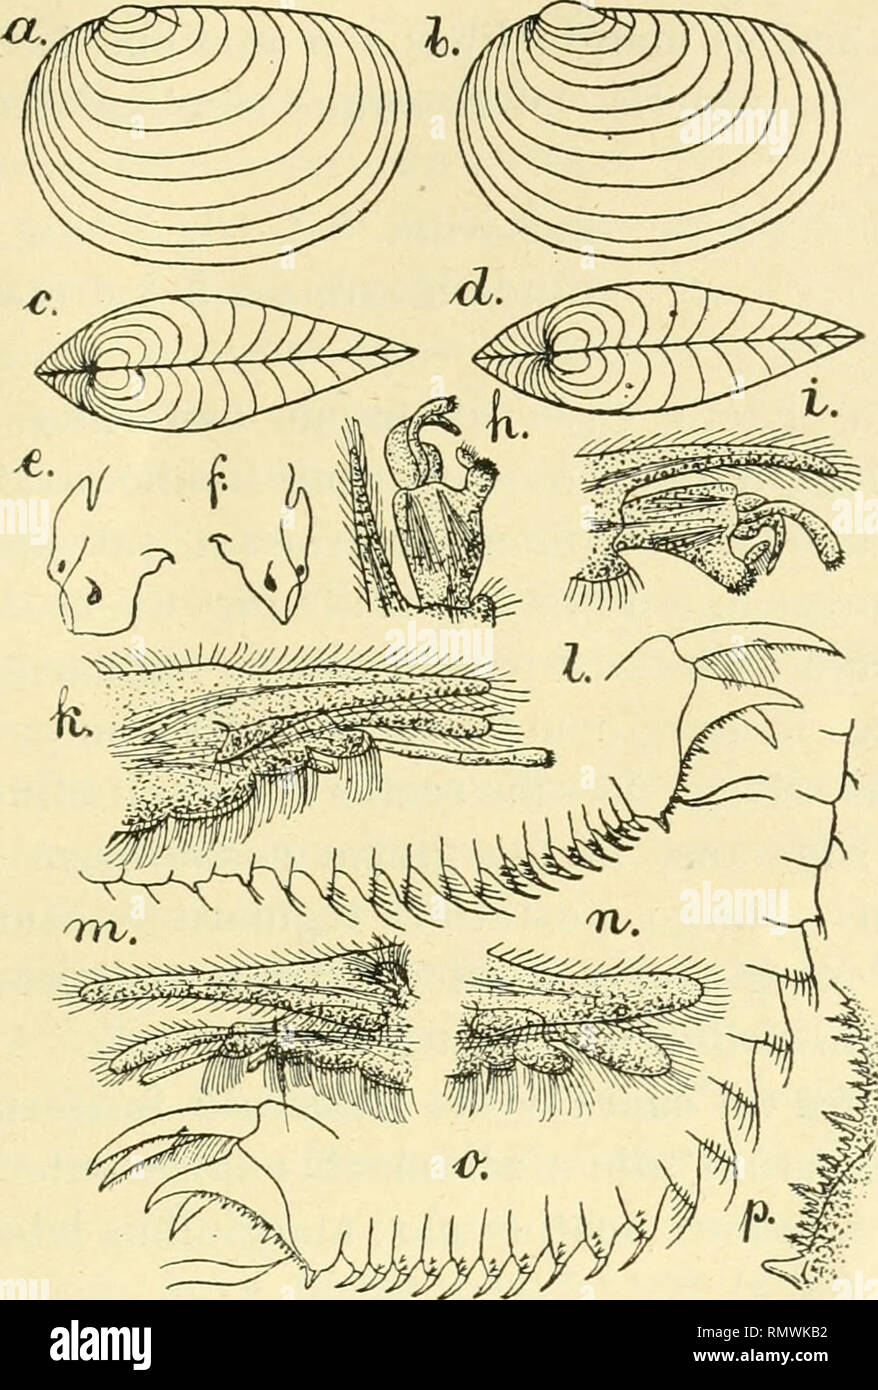 ". Los Annales des Sciences Naturelles. Zoología; Biología. PHYLLOPODES CONCIIOSTRACES 287 3, 3, 5, 7, 1, 3, 3, 5, 5, 5, 5, o 5, 1, 3, 3, 3, 5, 5, o 7, 7 ; vel I, 3, 3,5, 5, 5, 5, 7, 7, ONU mediali ceteris lateralibiis vali- diore; segmenta 9 vel 10 antecedentia setis en série antrorsum. Fig. 64. - Papá inlermedius Cyzicus.n. sp.-una concha a latere, Ç, 1 : 3 cf:6, concha a latere, 1 : 3: c, 9 concha supra visae, 1:3; d 'J conchao supra visac, 1:3; e. un caput"" un latei-e 1 : o: /"" 9, caput un latere, 1:5: G, D* pars apicalls pedum primi París, 1 : 10: /i, 1, <3 pars apiealis pedum 2-di p Foto de stock"